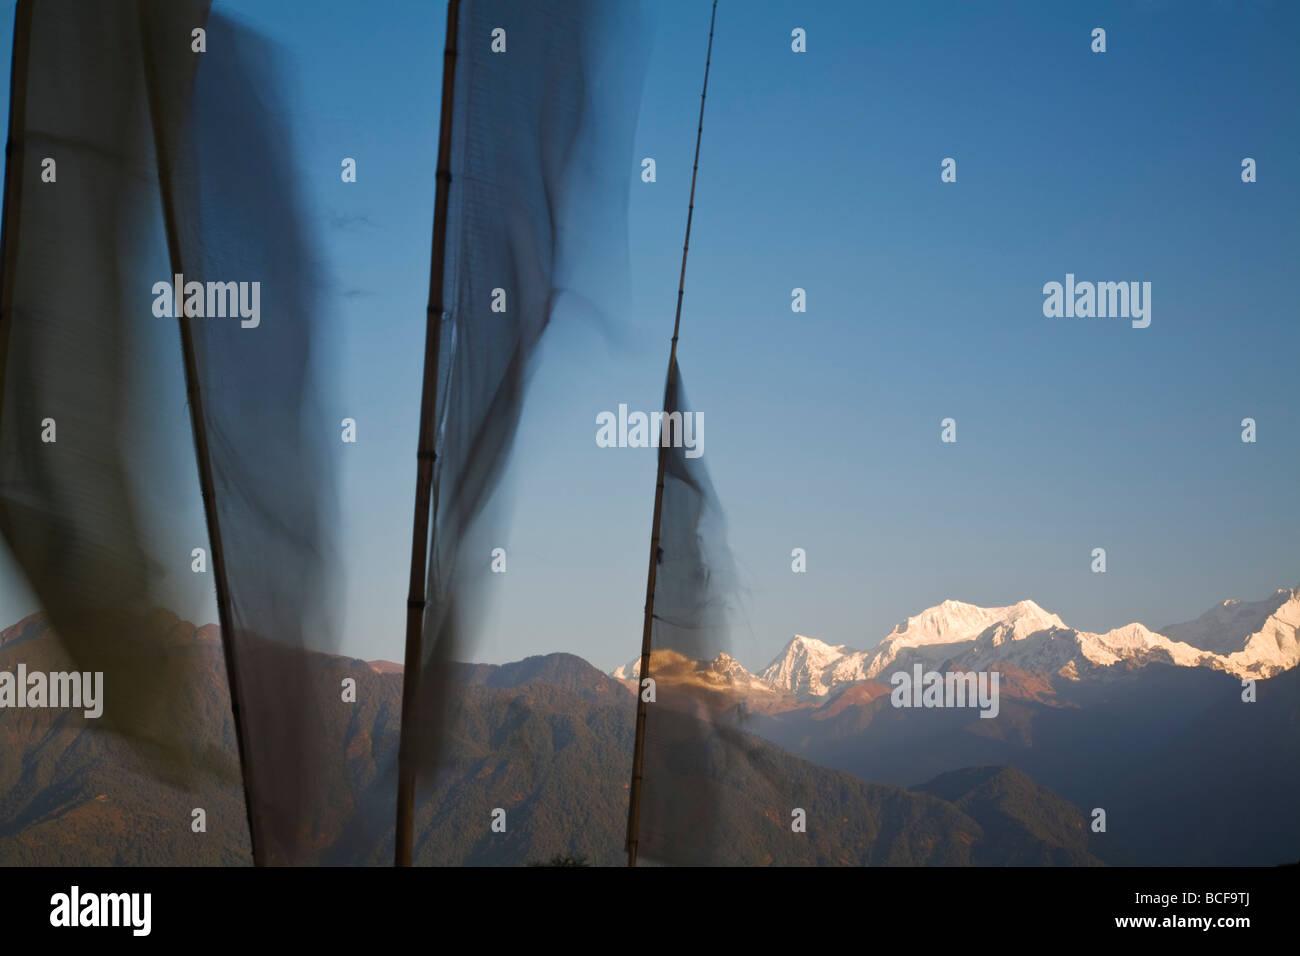 India, Sikkim, Pelling, Superior Pelling, banderas de oración y Kangchenjunga, gama de Kangchendzonga Imagen De Stock